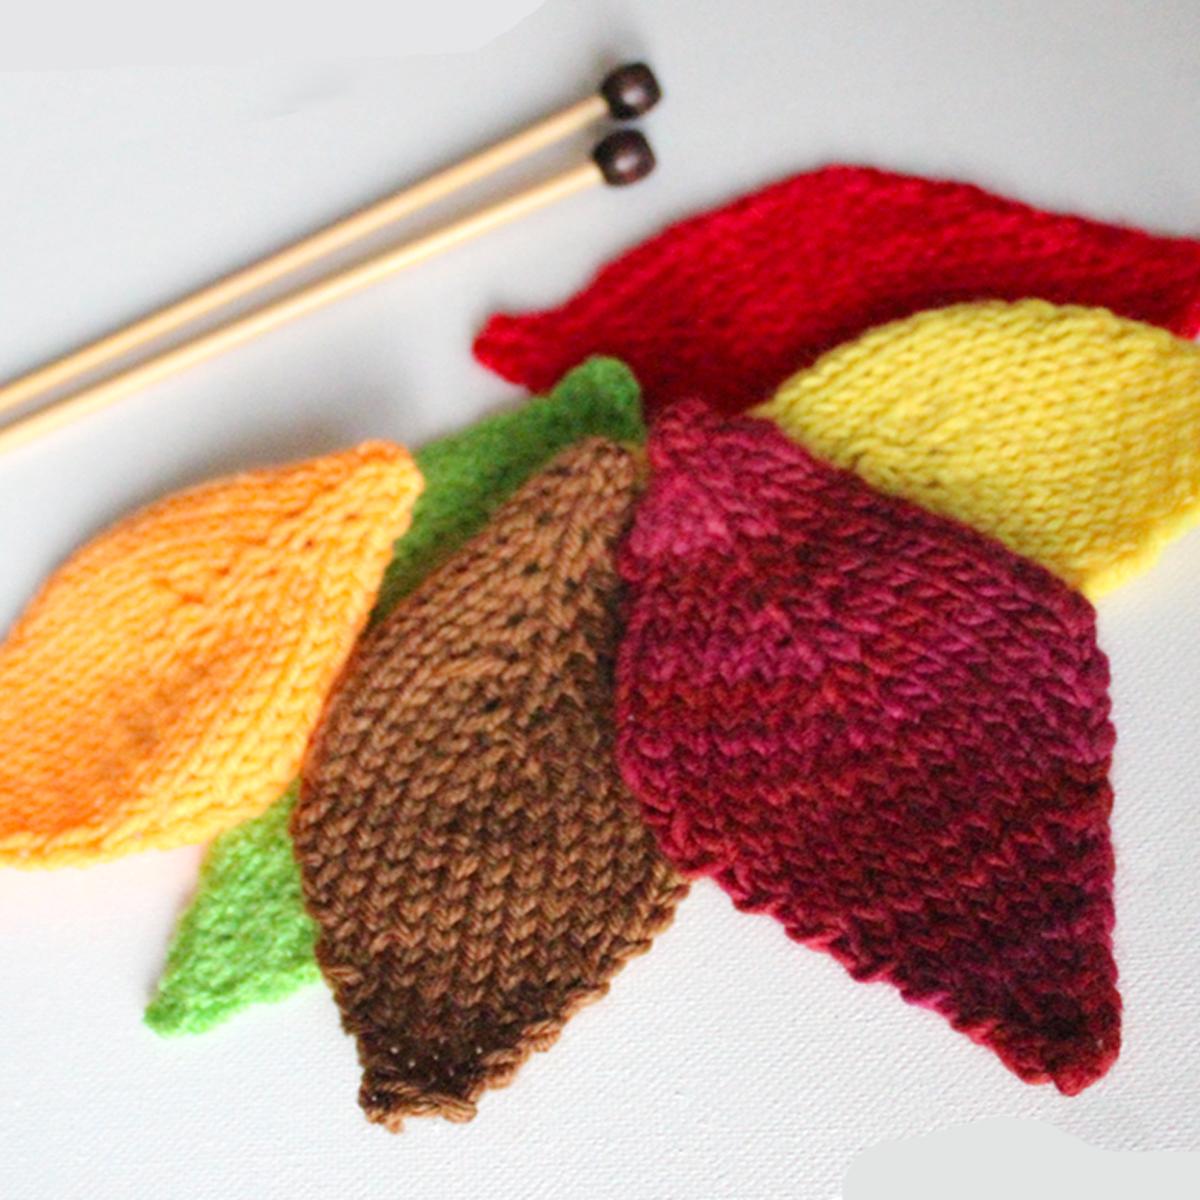 autumn leaves Knitting flowers